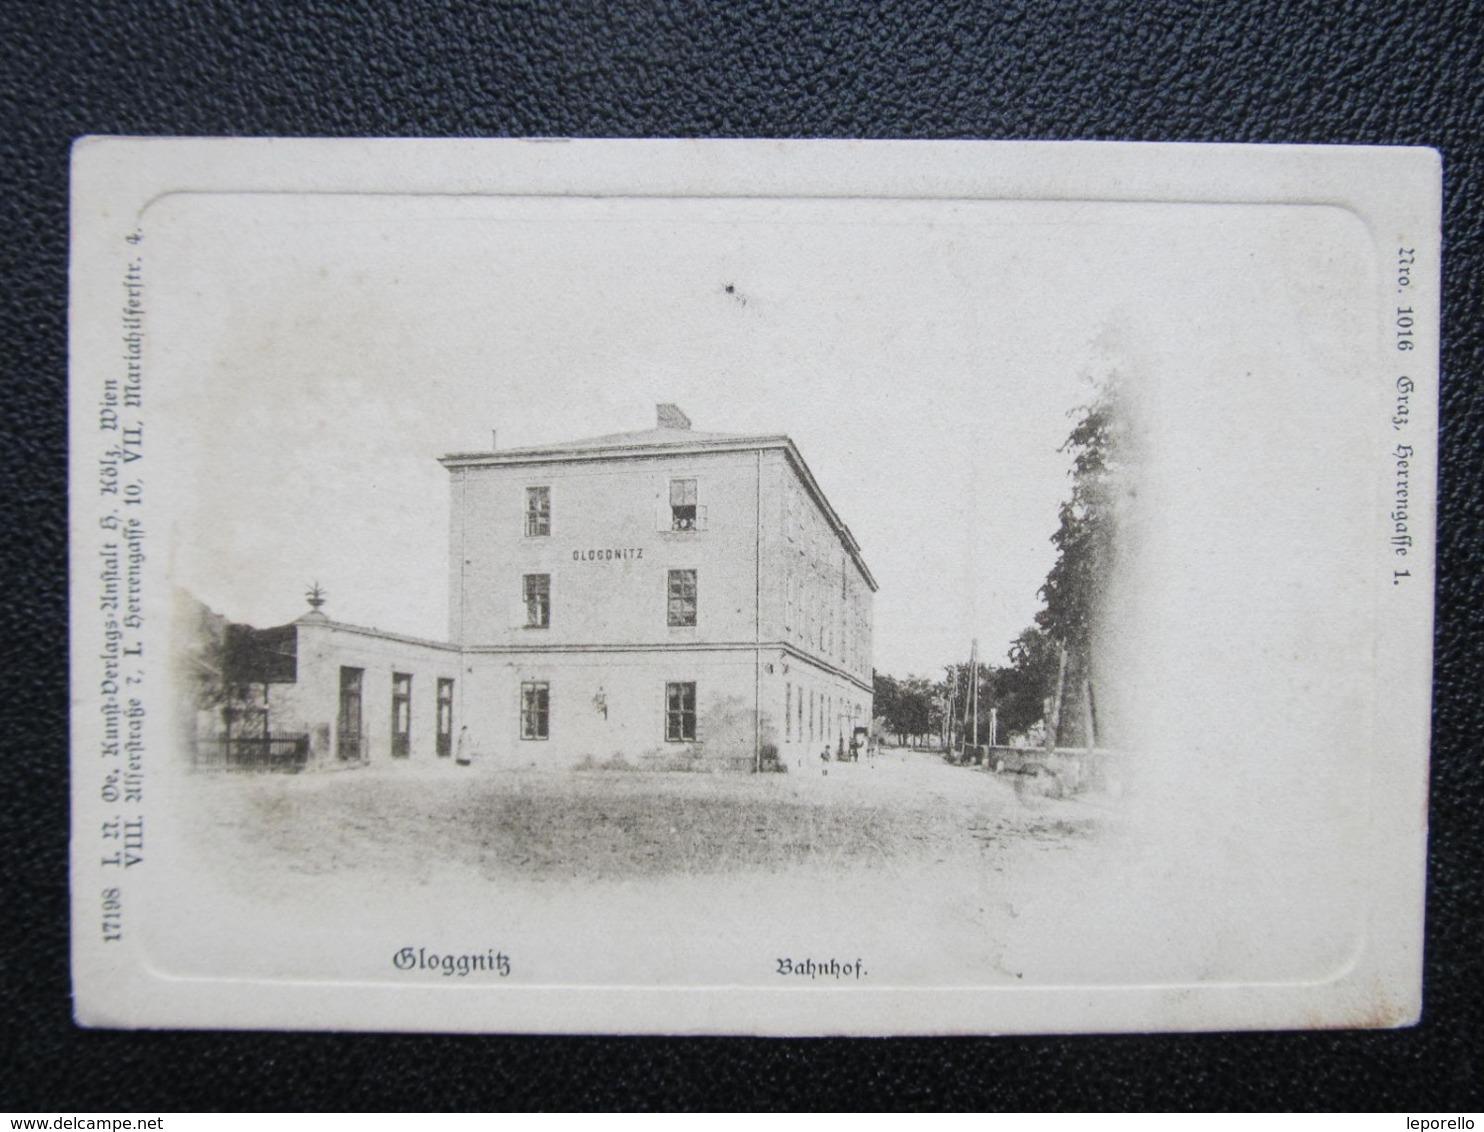 AK GLOGGNITZ Bahnhof 1900 /////  D*40033 - Semmering